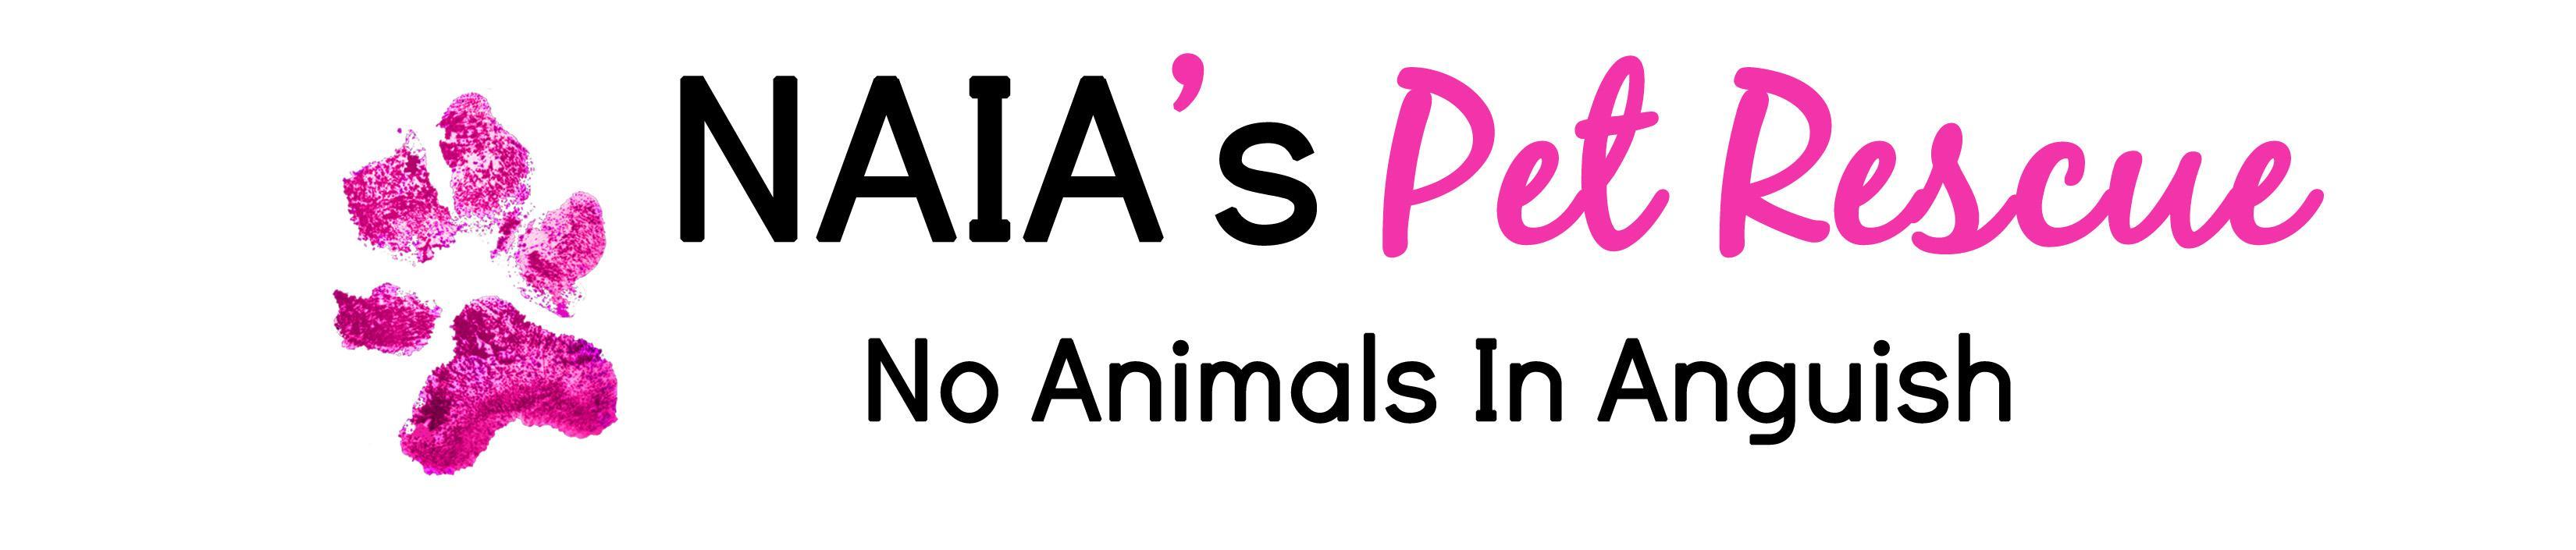 NAIA's Pet Rescue